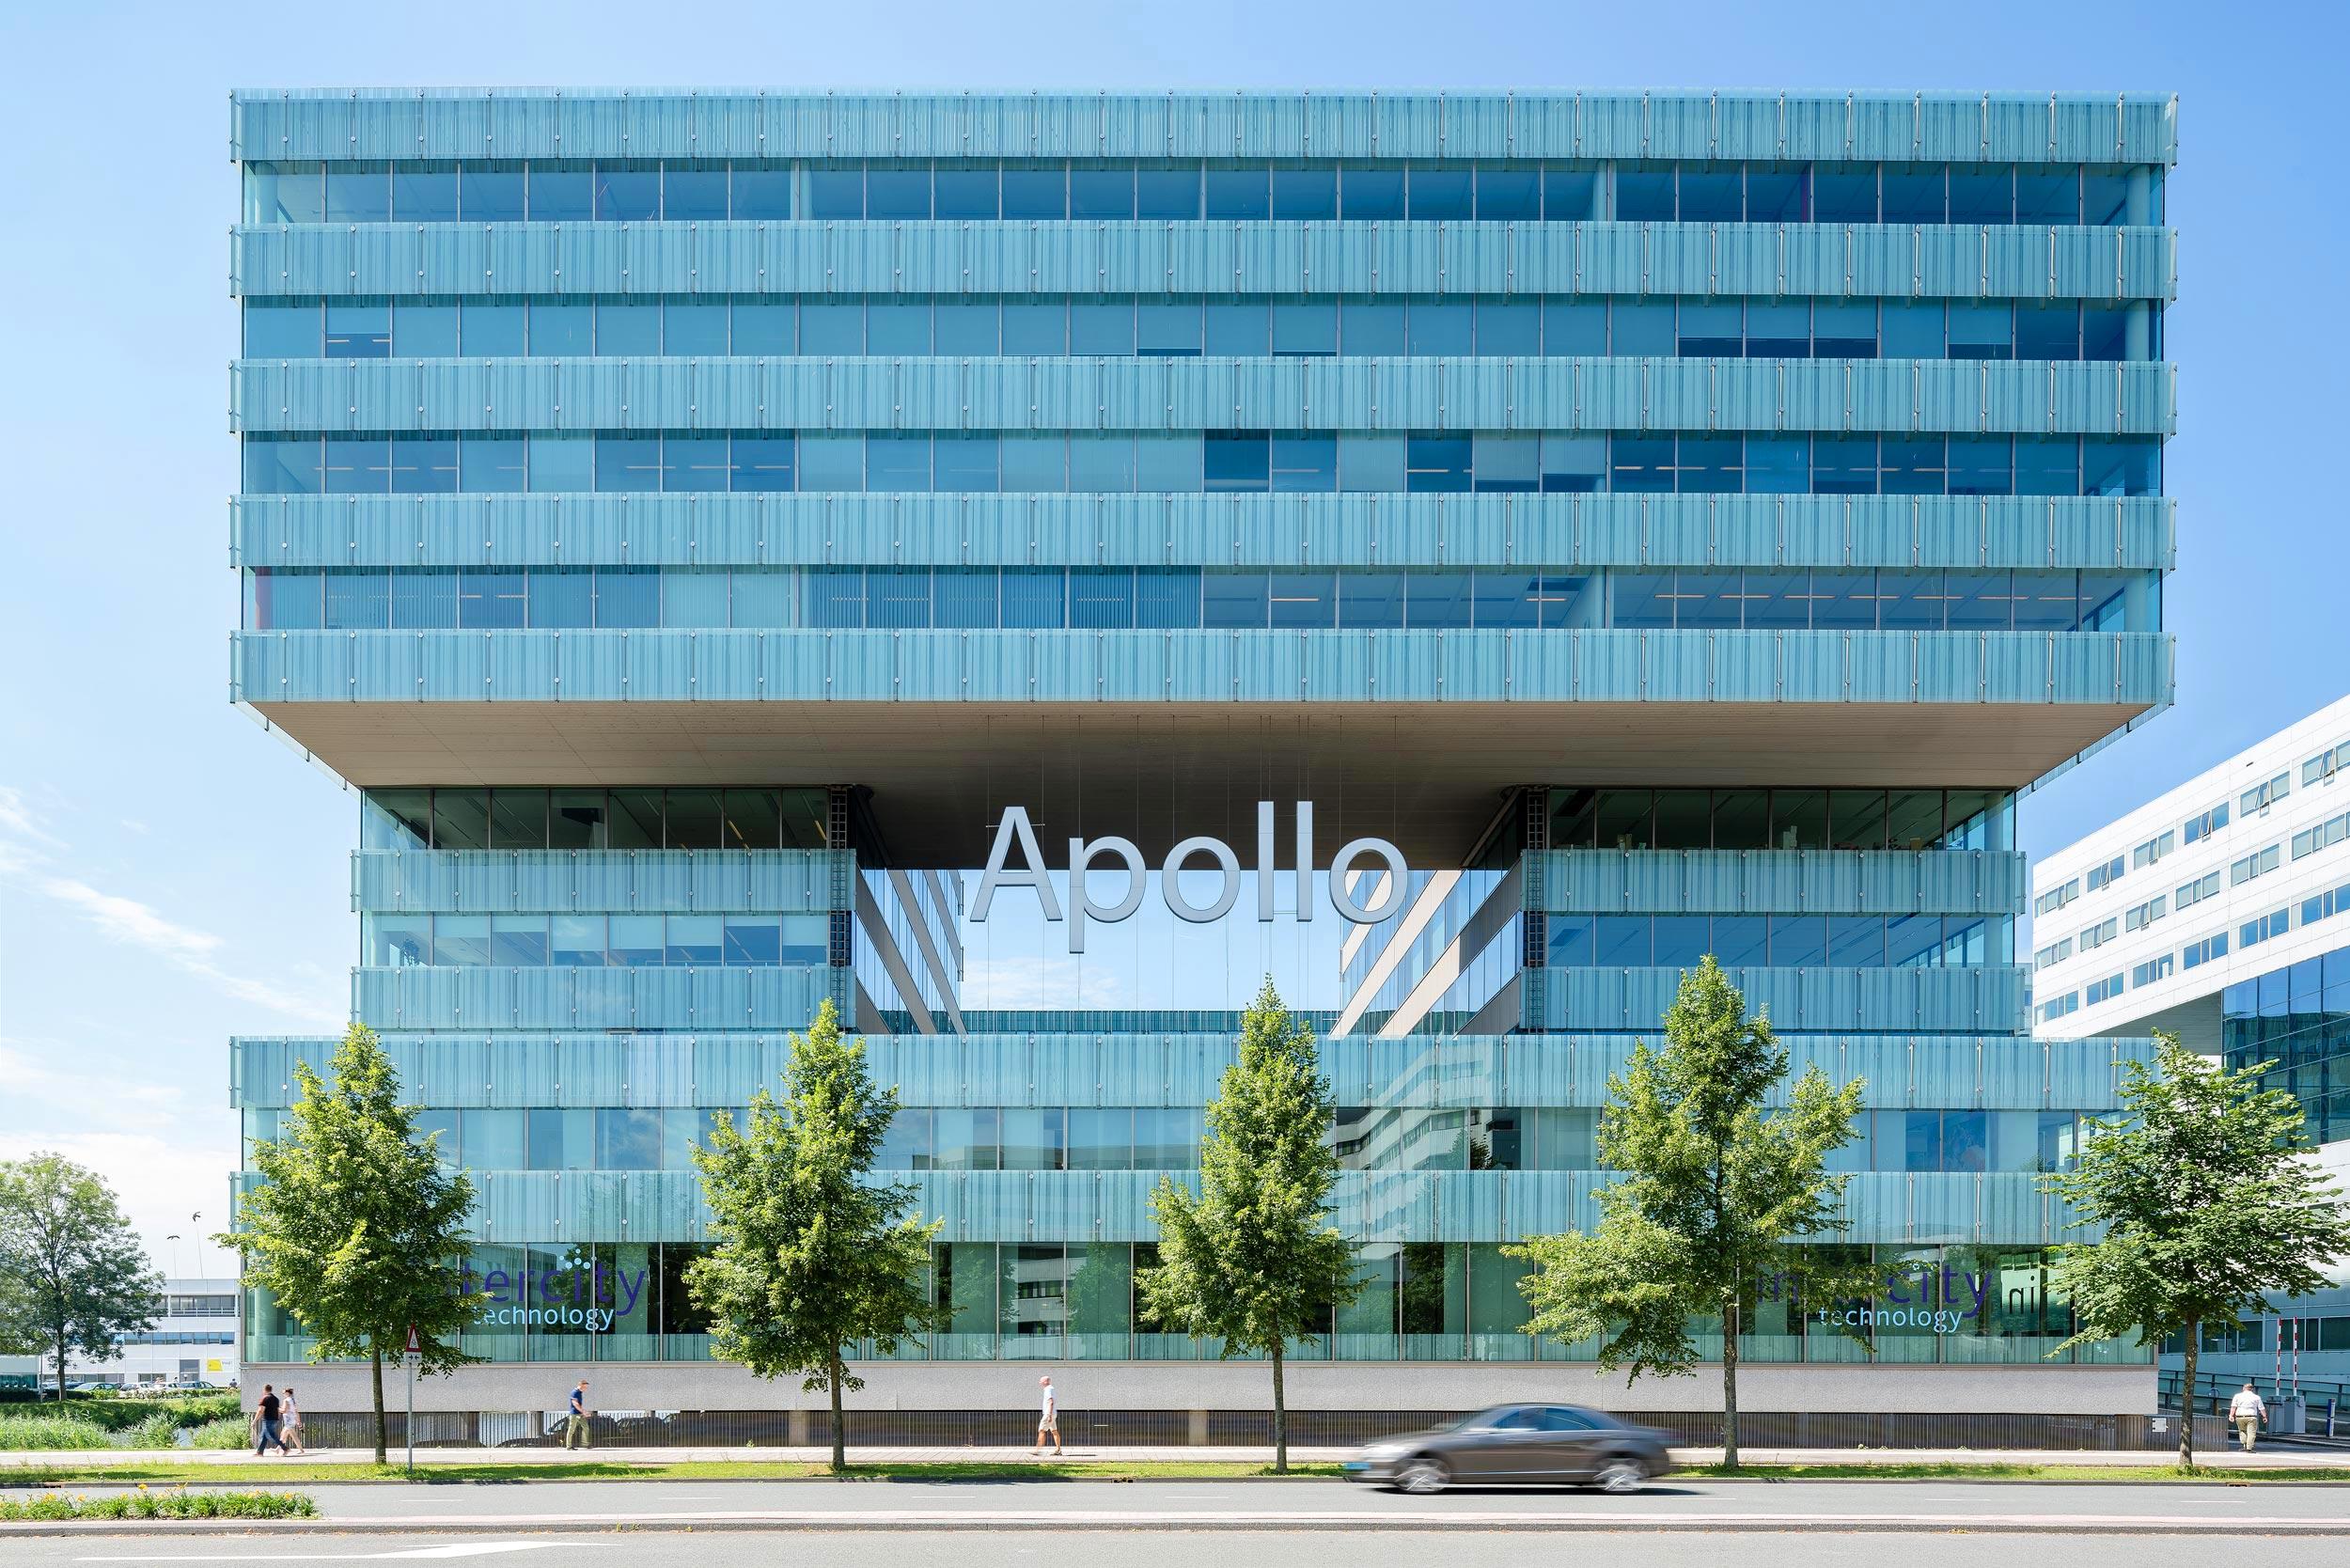 Kantoor gebouw Apollo Amsterdam - architectuurfotograaf Chiel de Nooyer